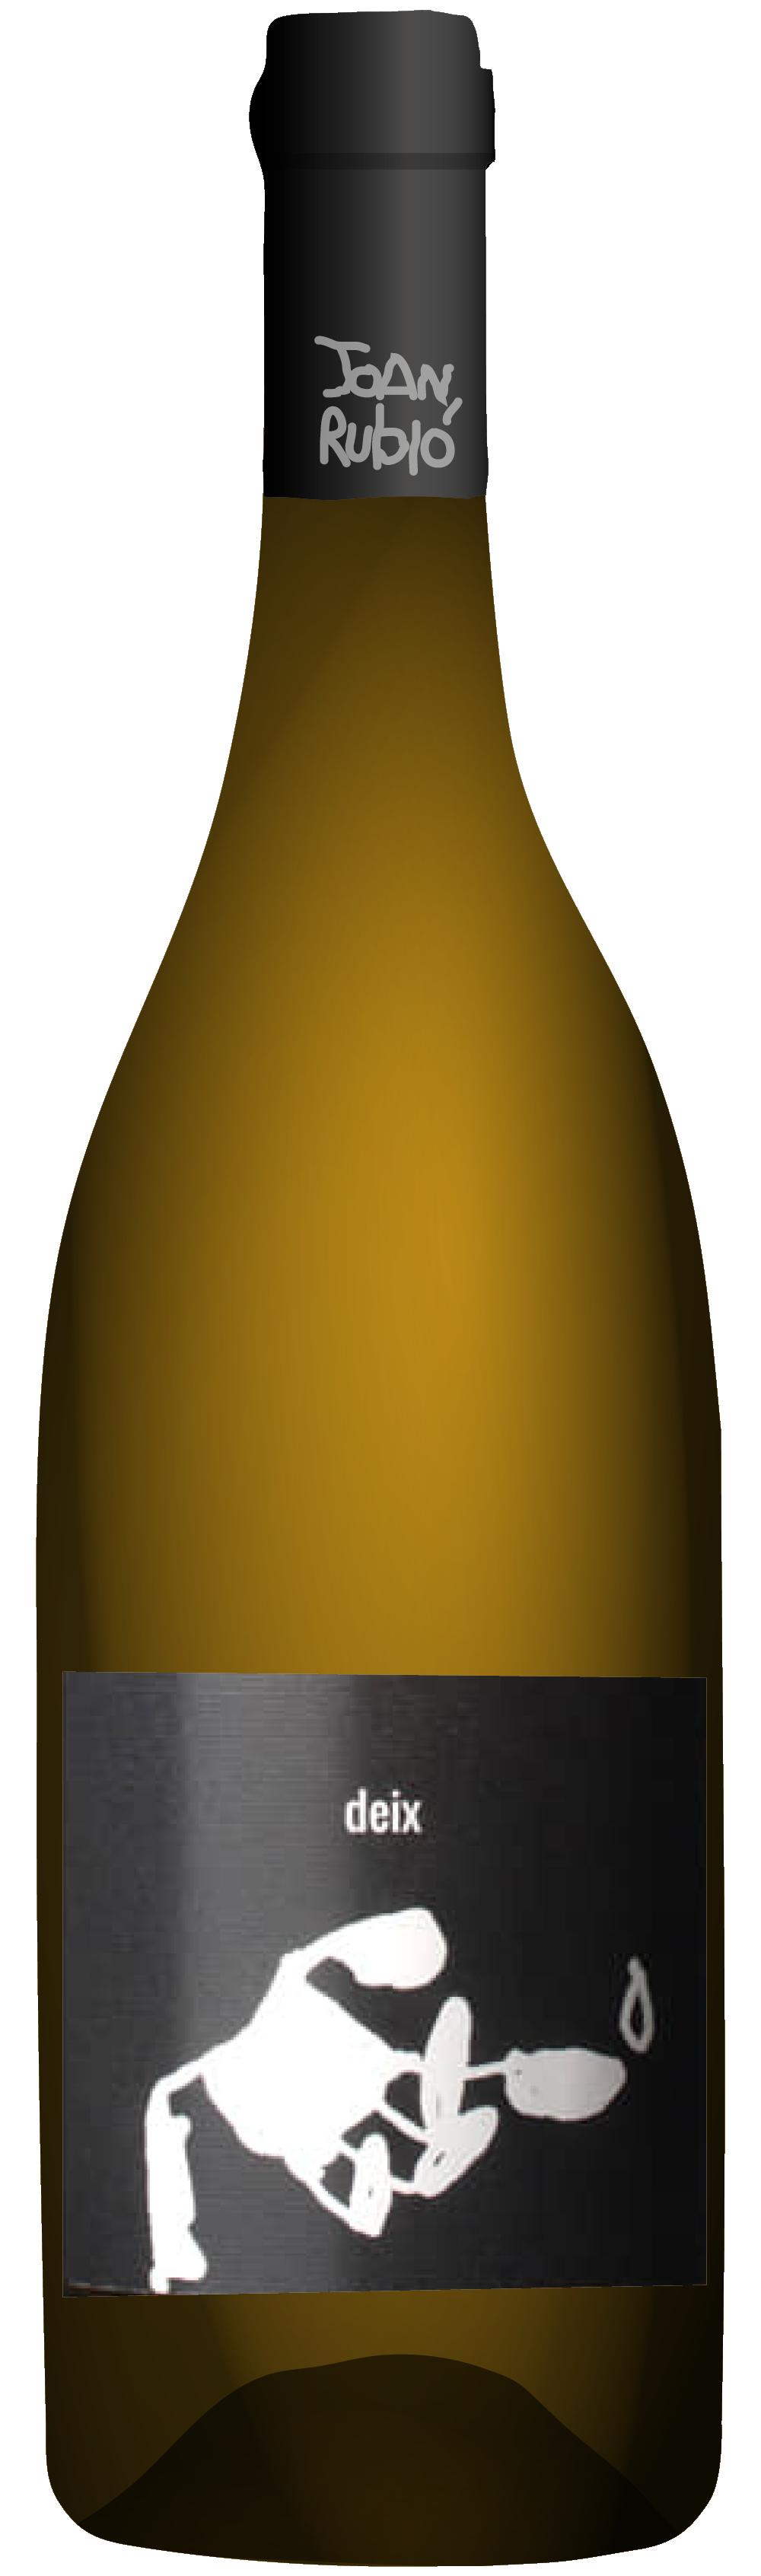 the natural wine company club december 2020 spain joan rubio deix 3